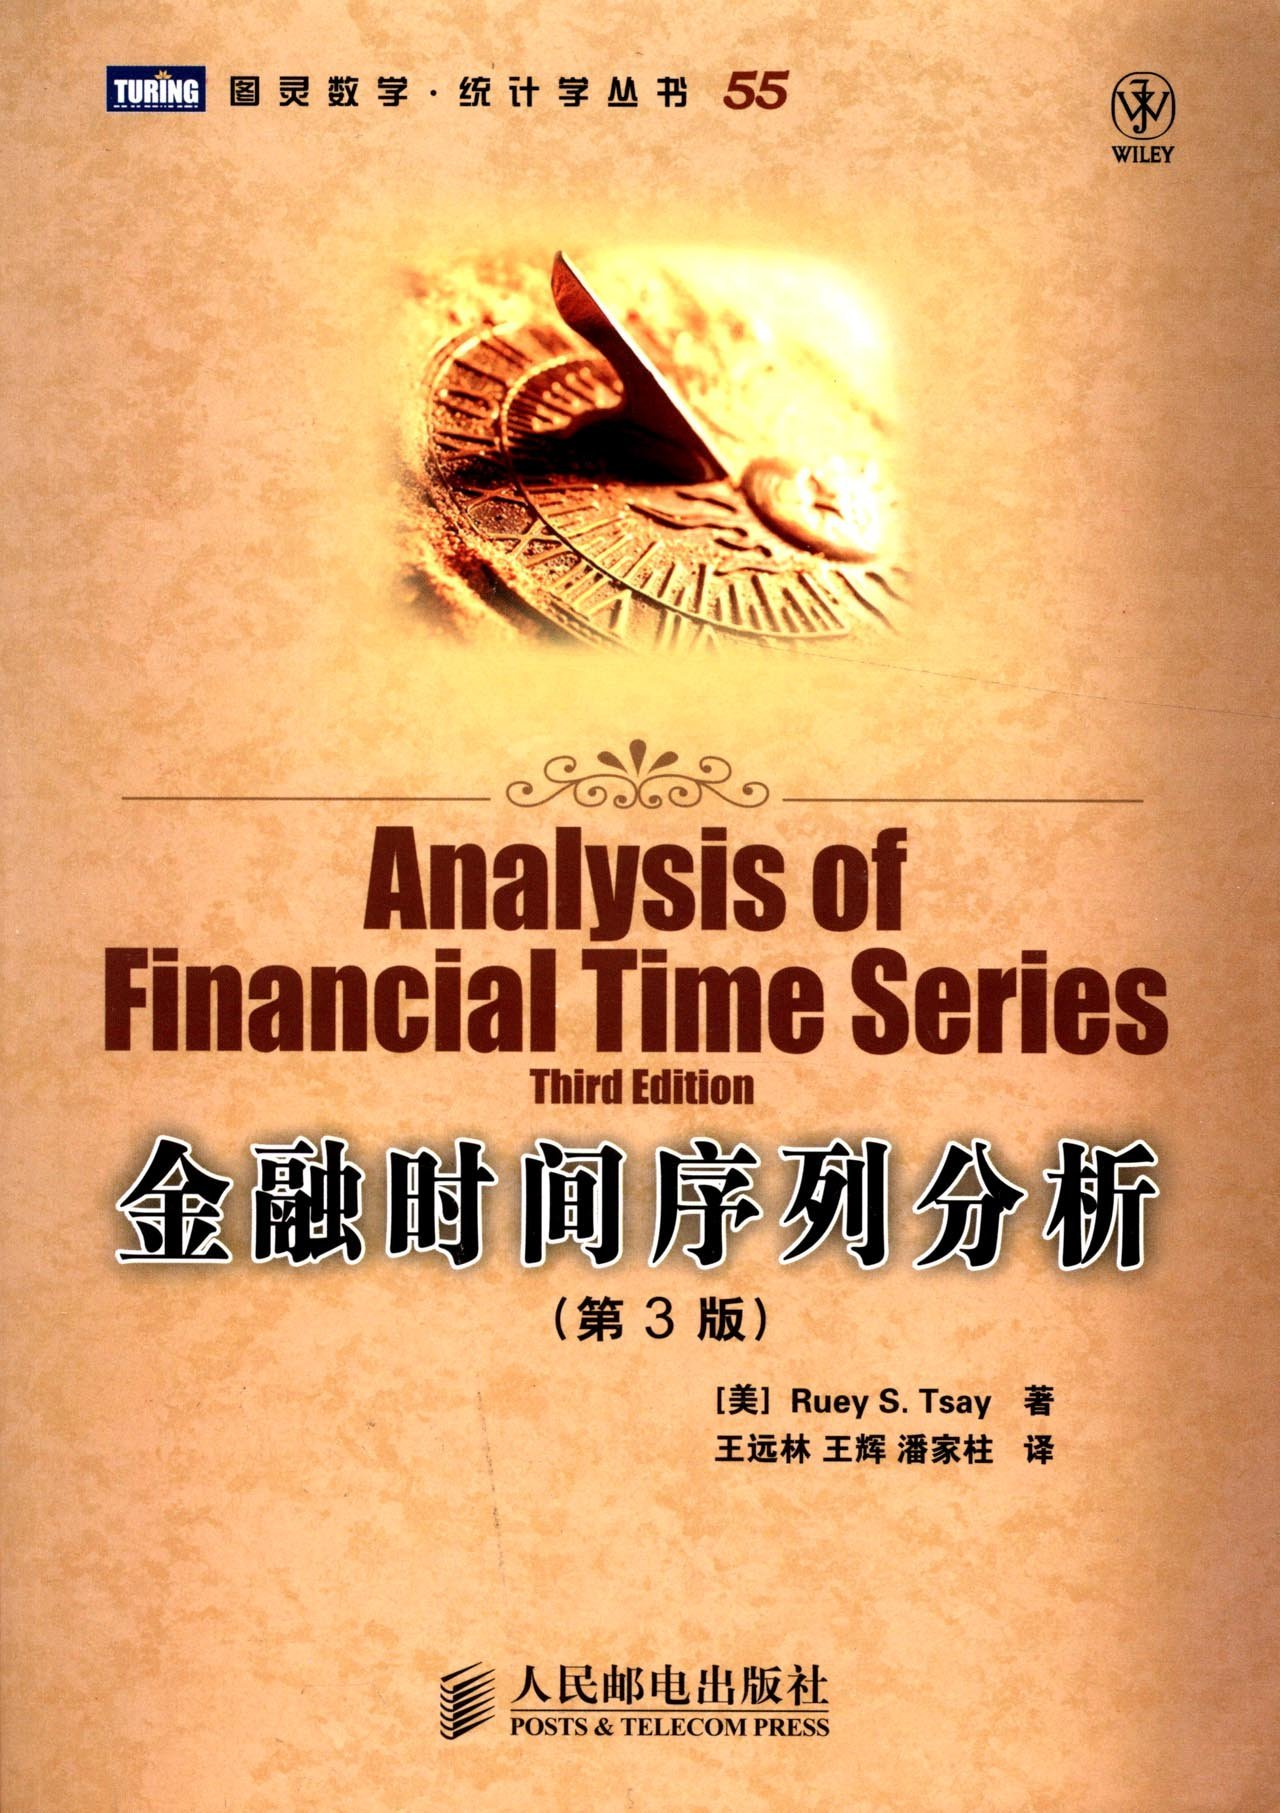 Read Online 图灵数学·统计学丛书: 金融时间序列分析 (第3版) ebook